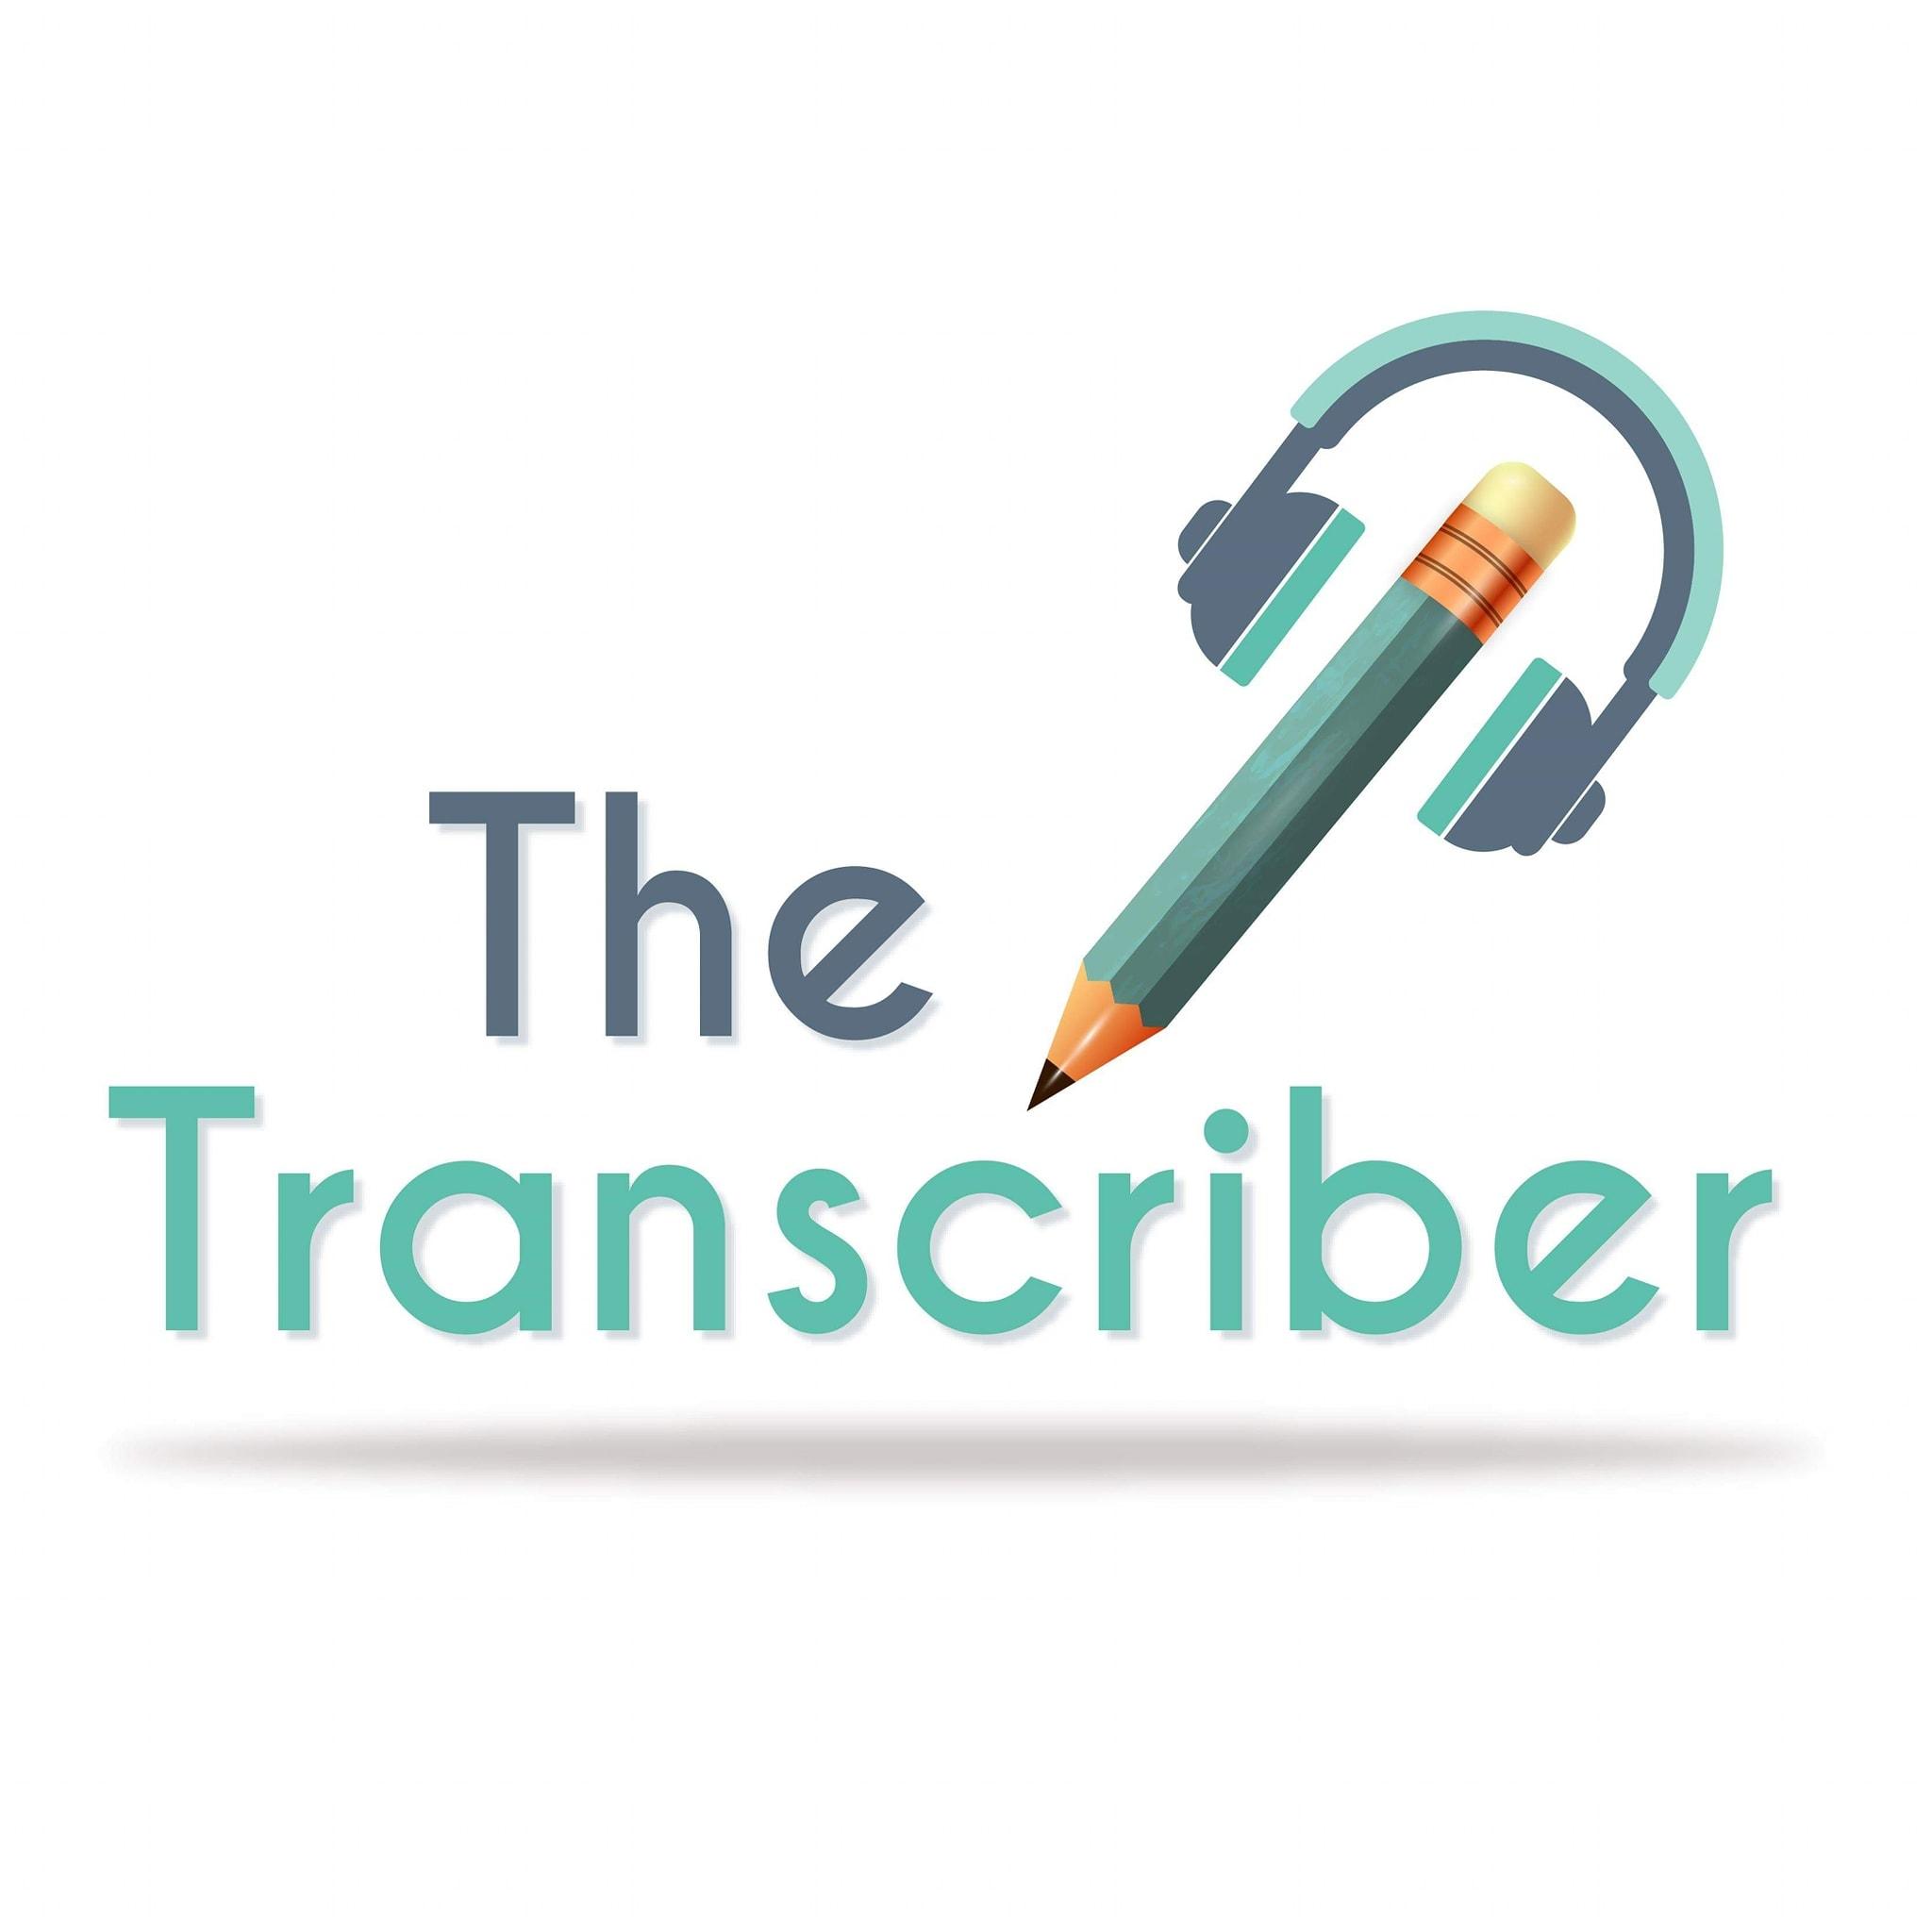 Urdu and English audio video transcription for 60min / 10x6 min record